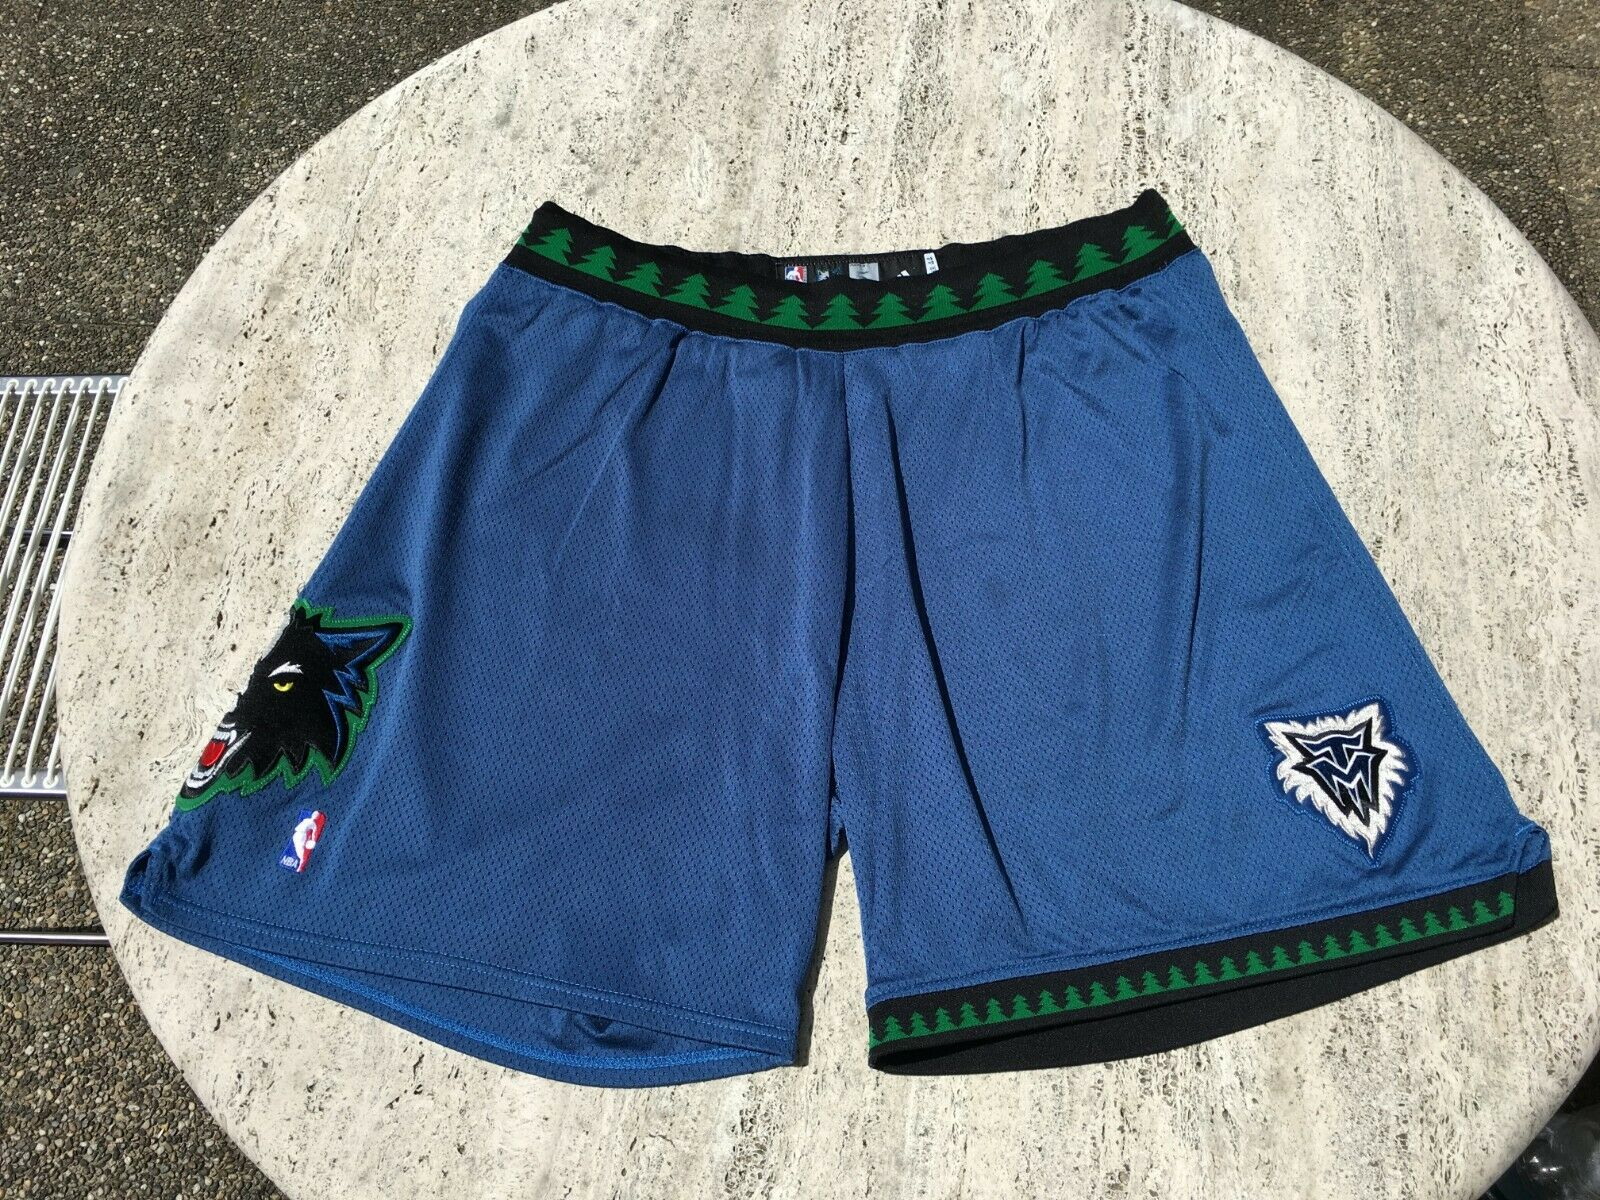 Adidas GAME WORN Minnesota Timberwolves korts CraIG SMITH NBA 44